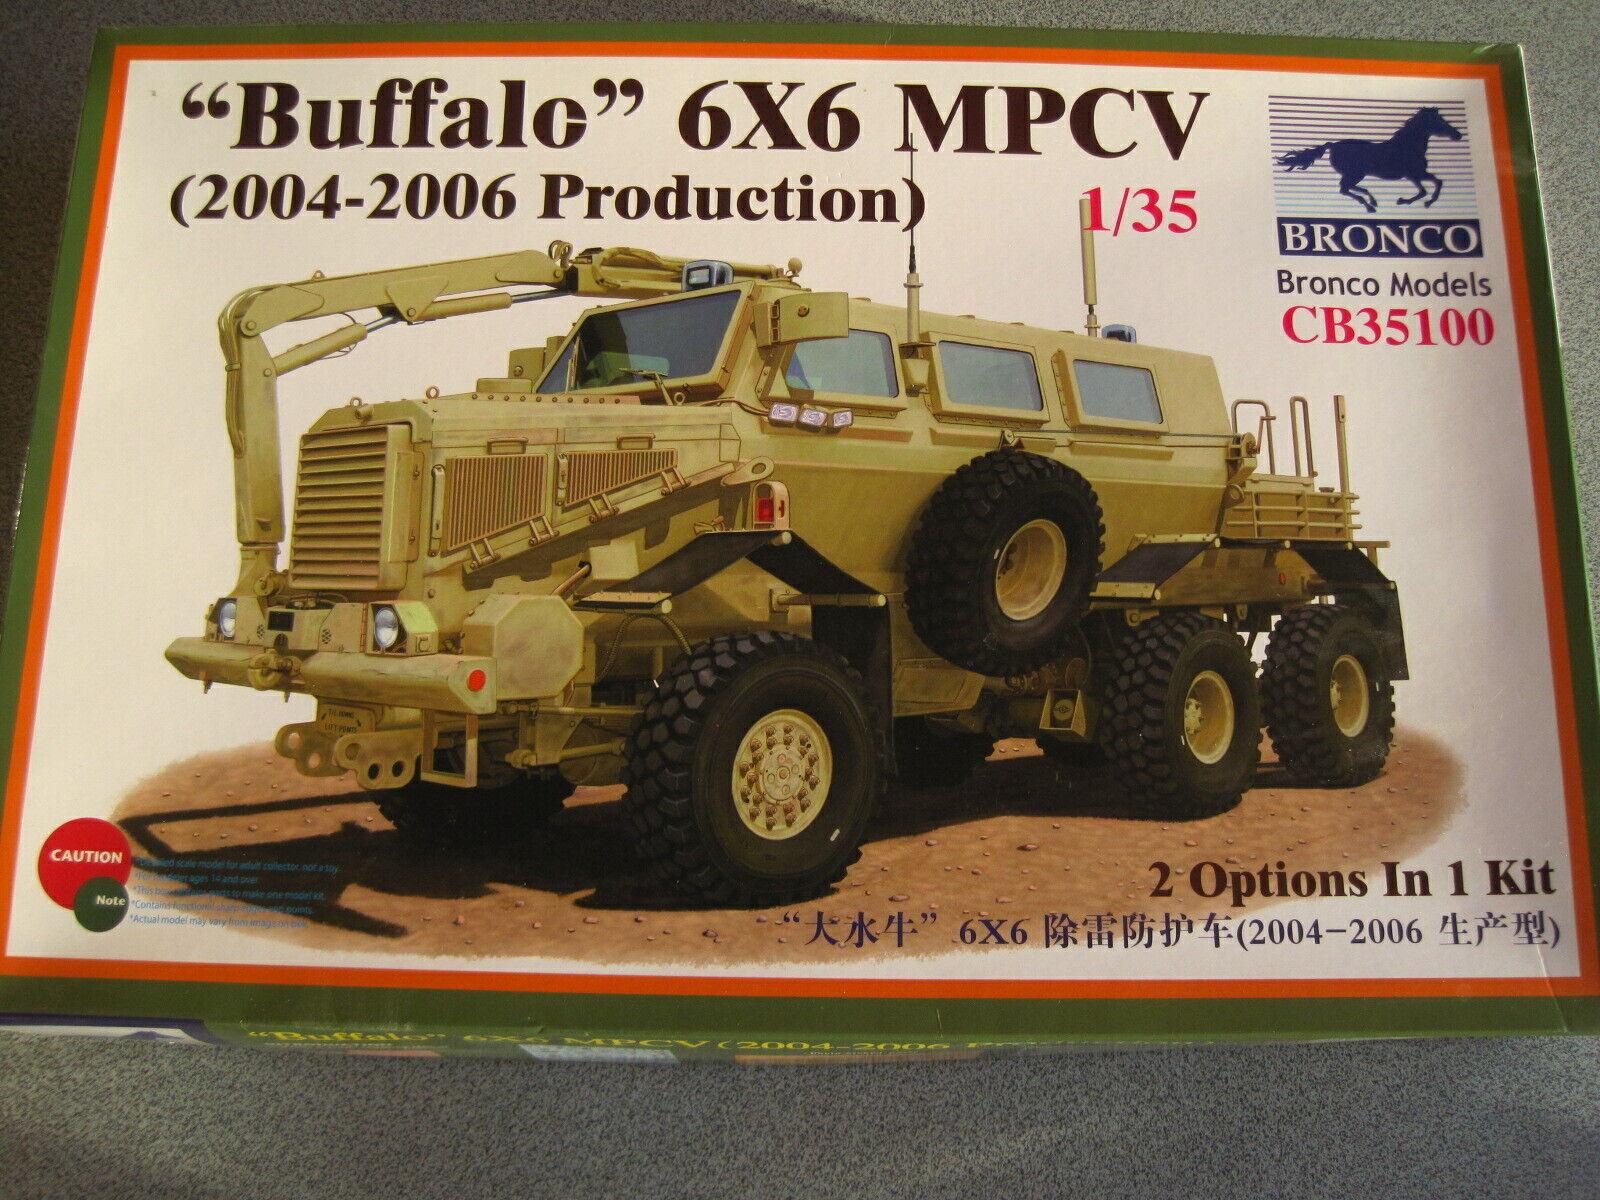 Buffalo 6x6 MPCV Bronco Models 35100 (2004-2006 Production) 1 35